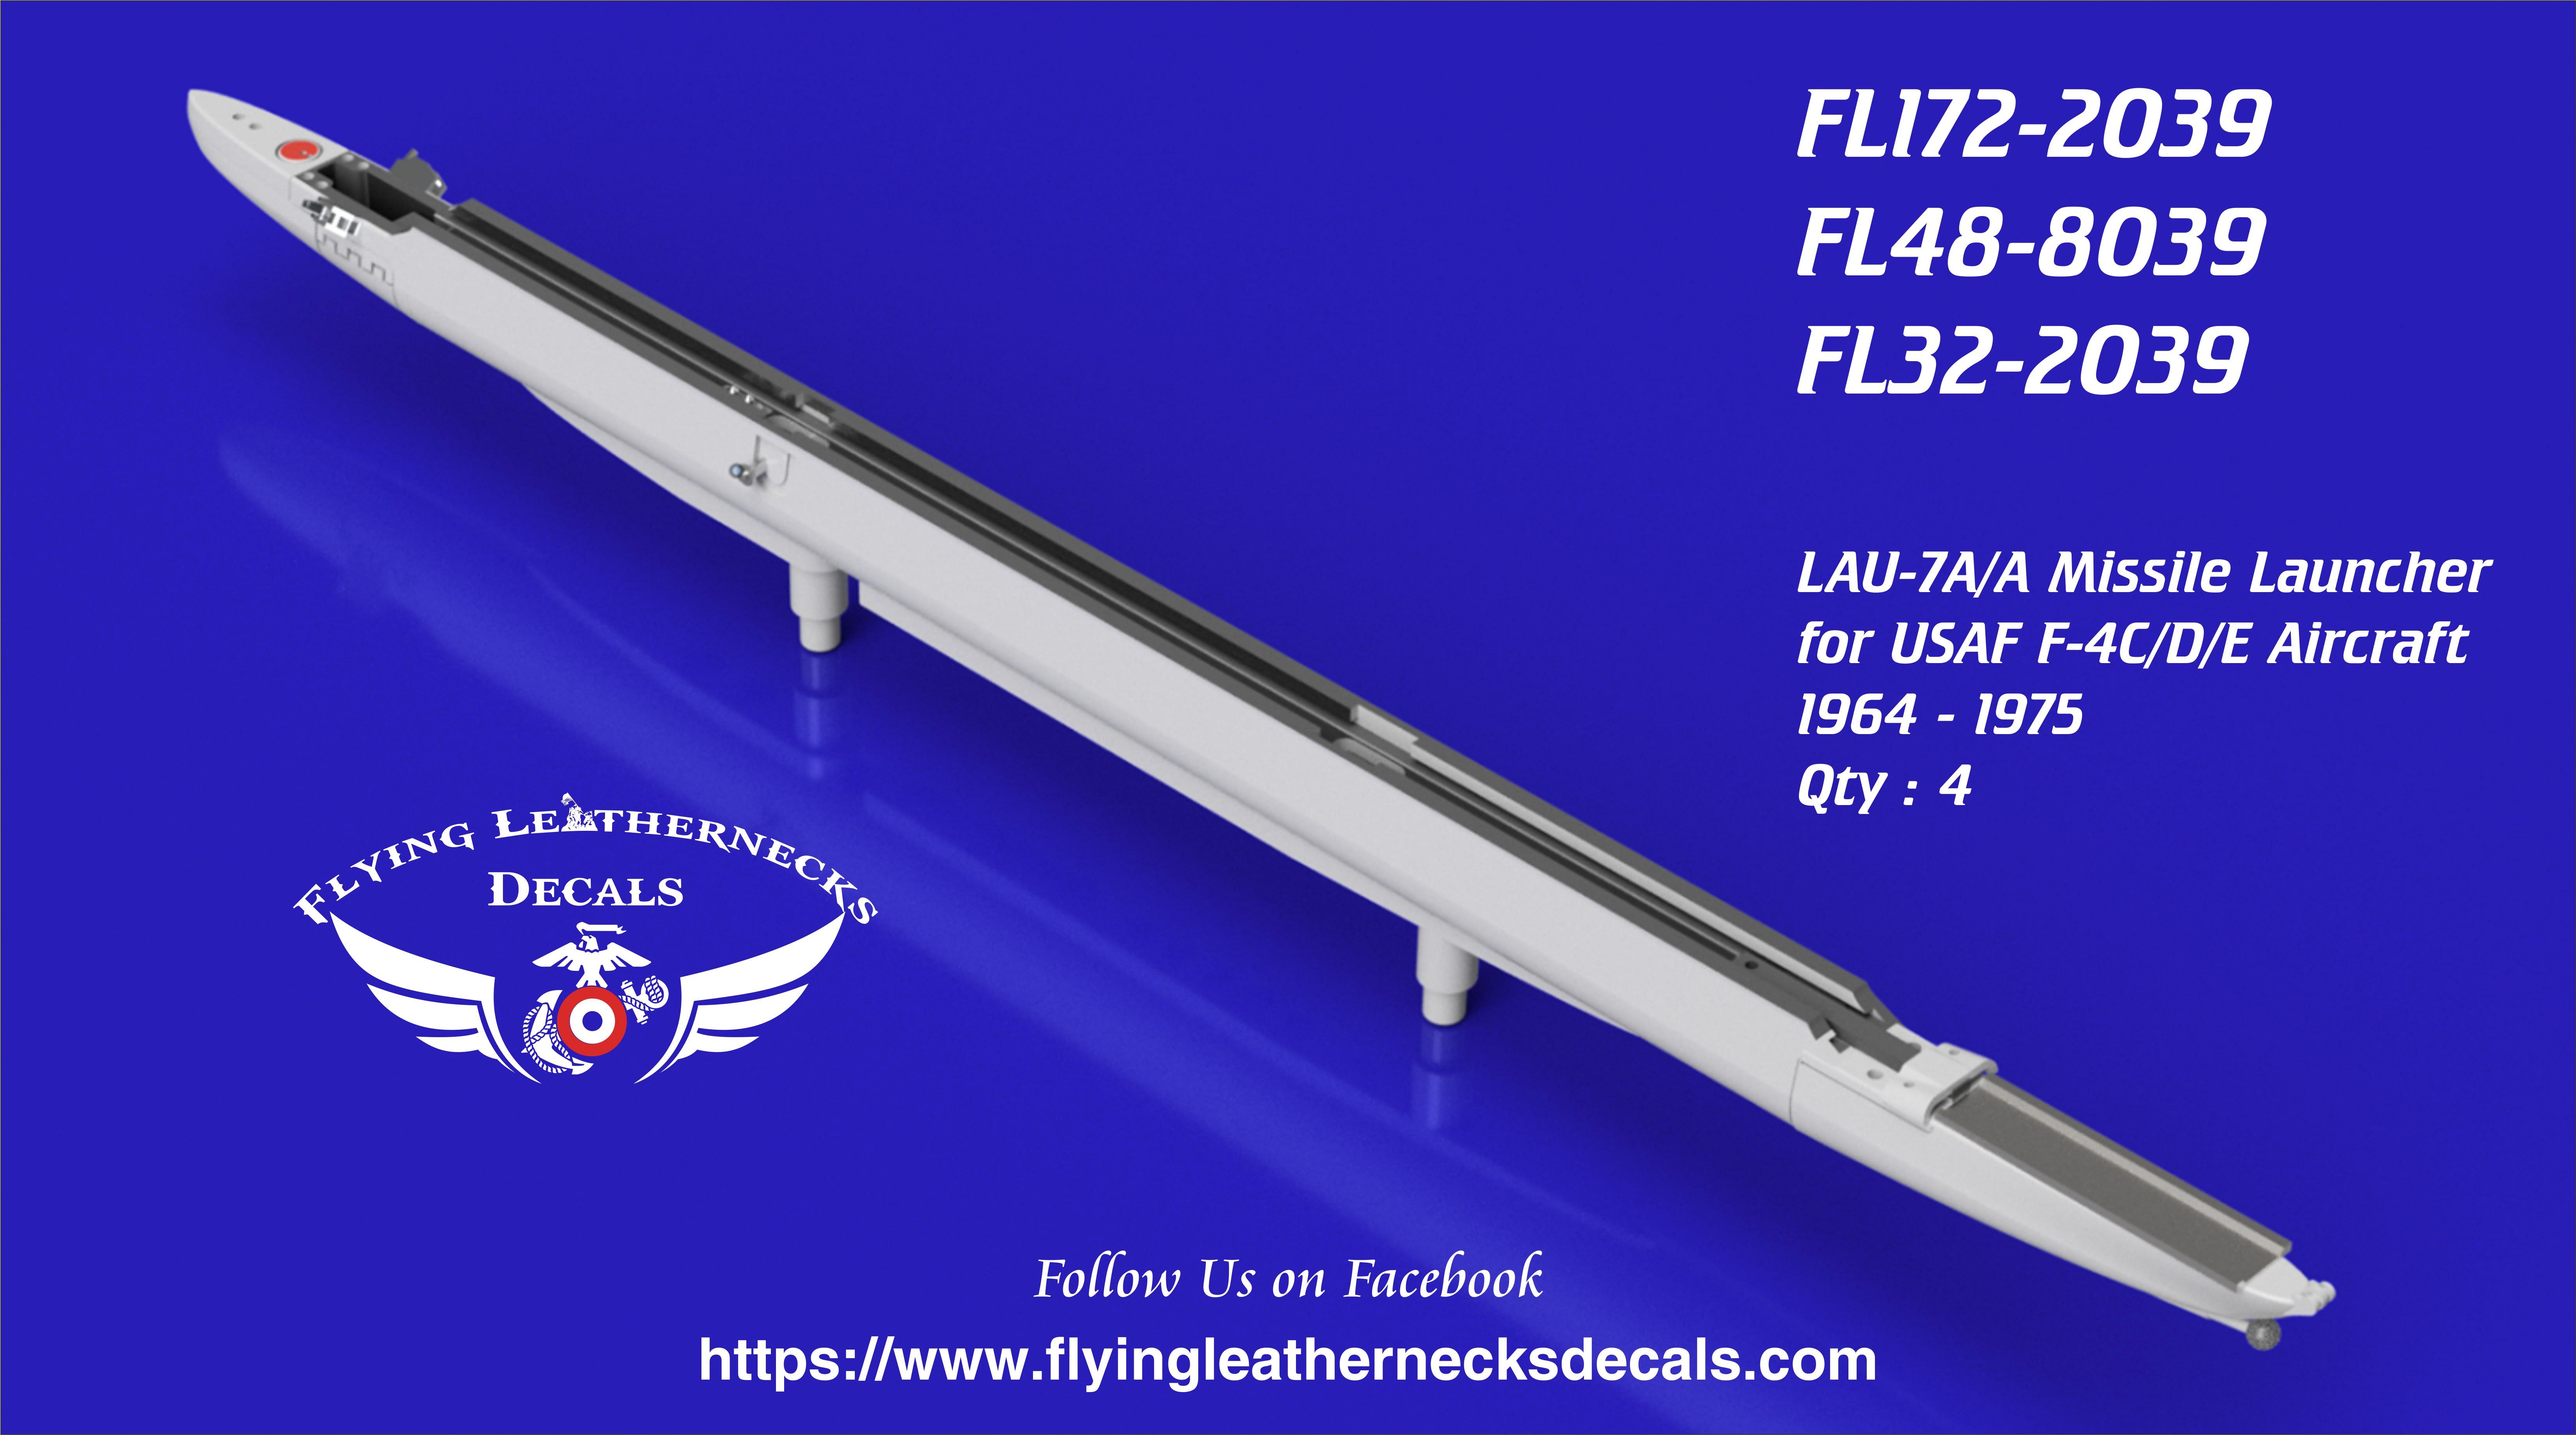 FL172-2039